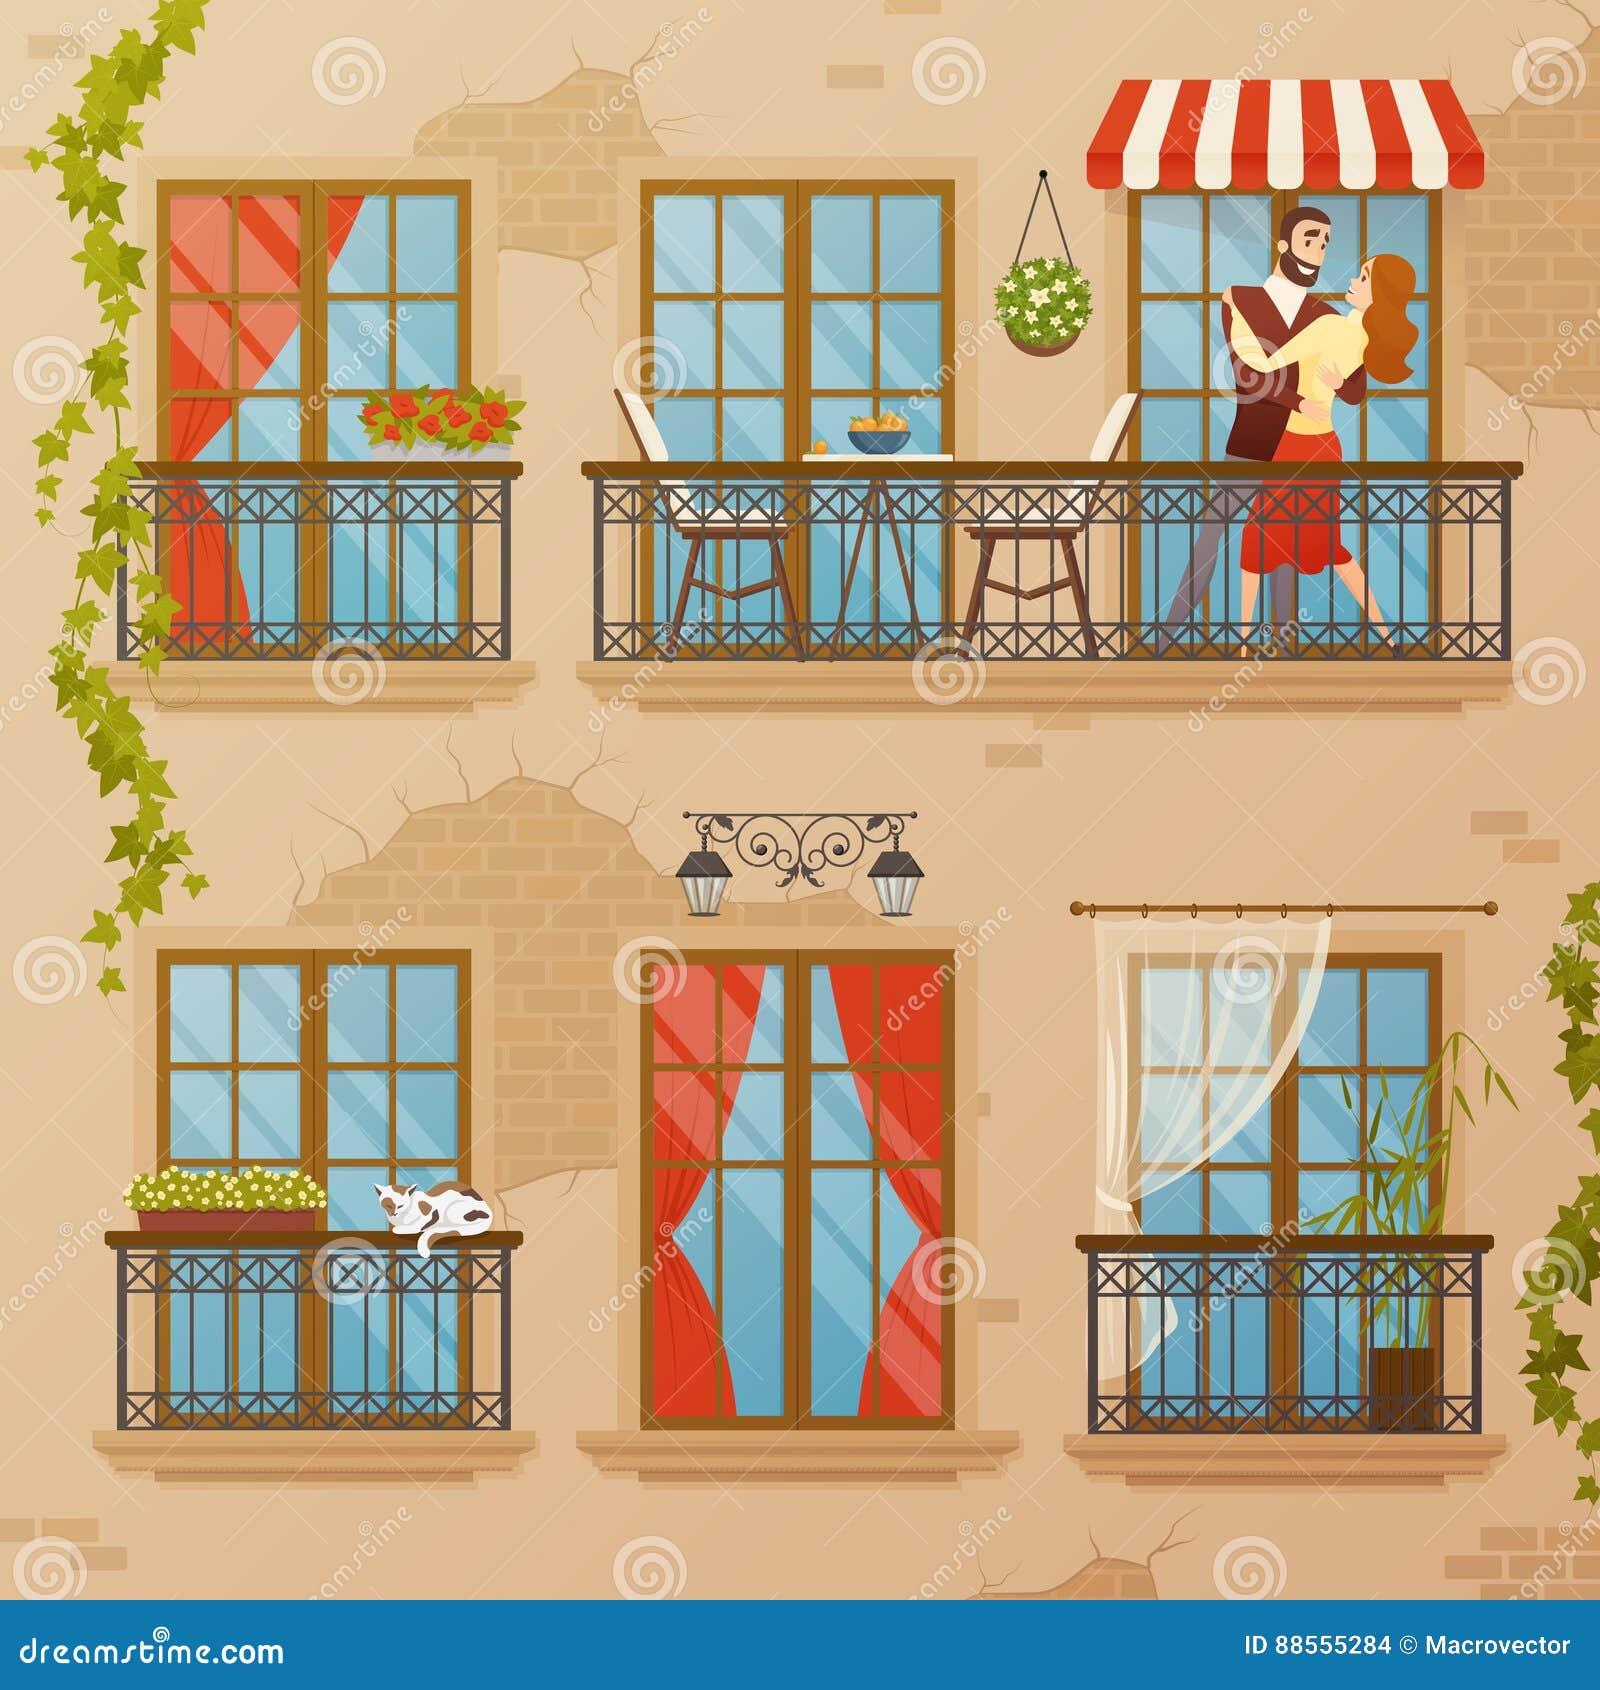 Classic Window Balconies Composition Stock Vector - Illustration of ...